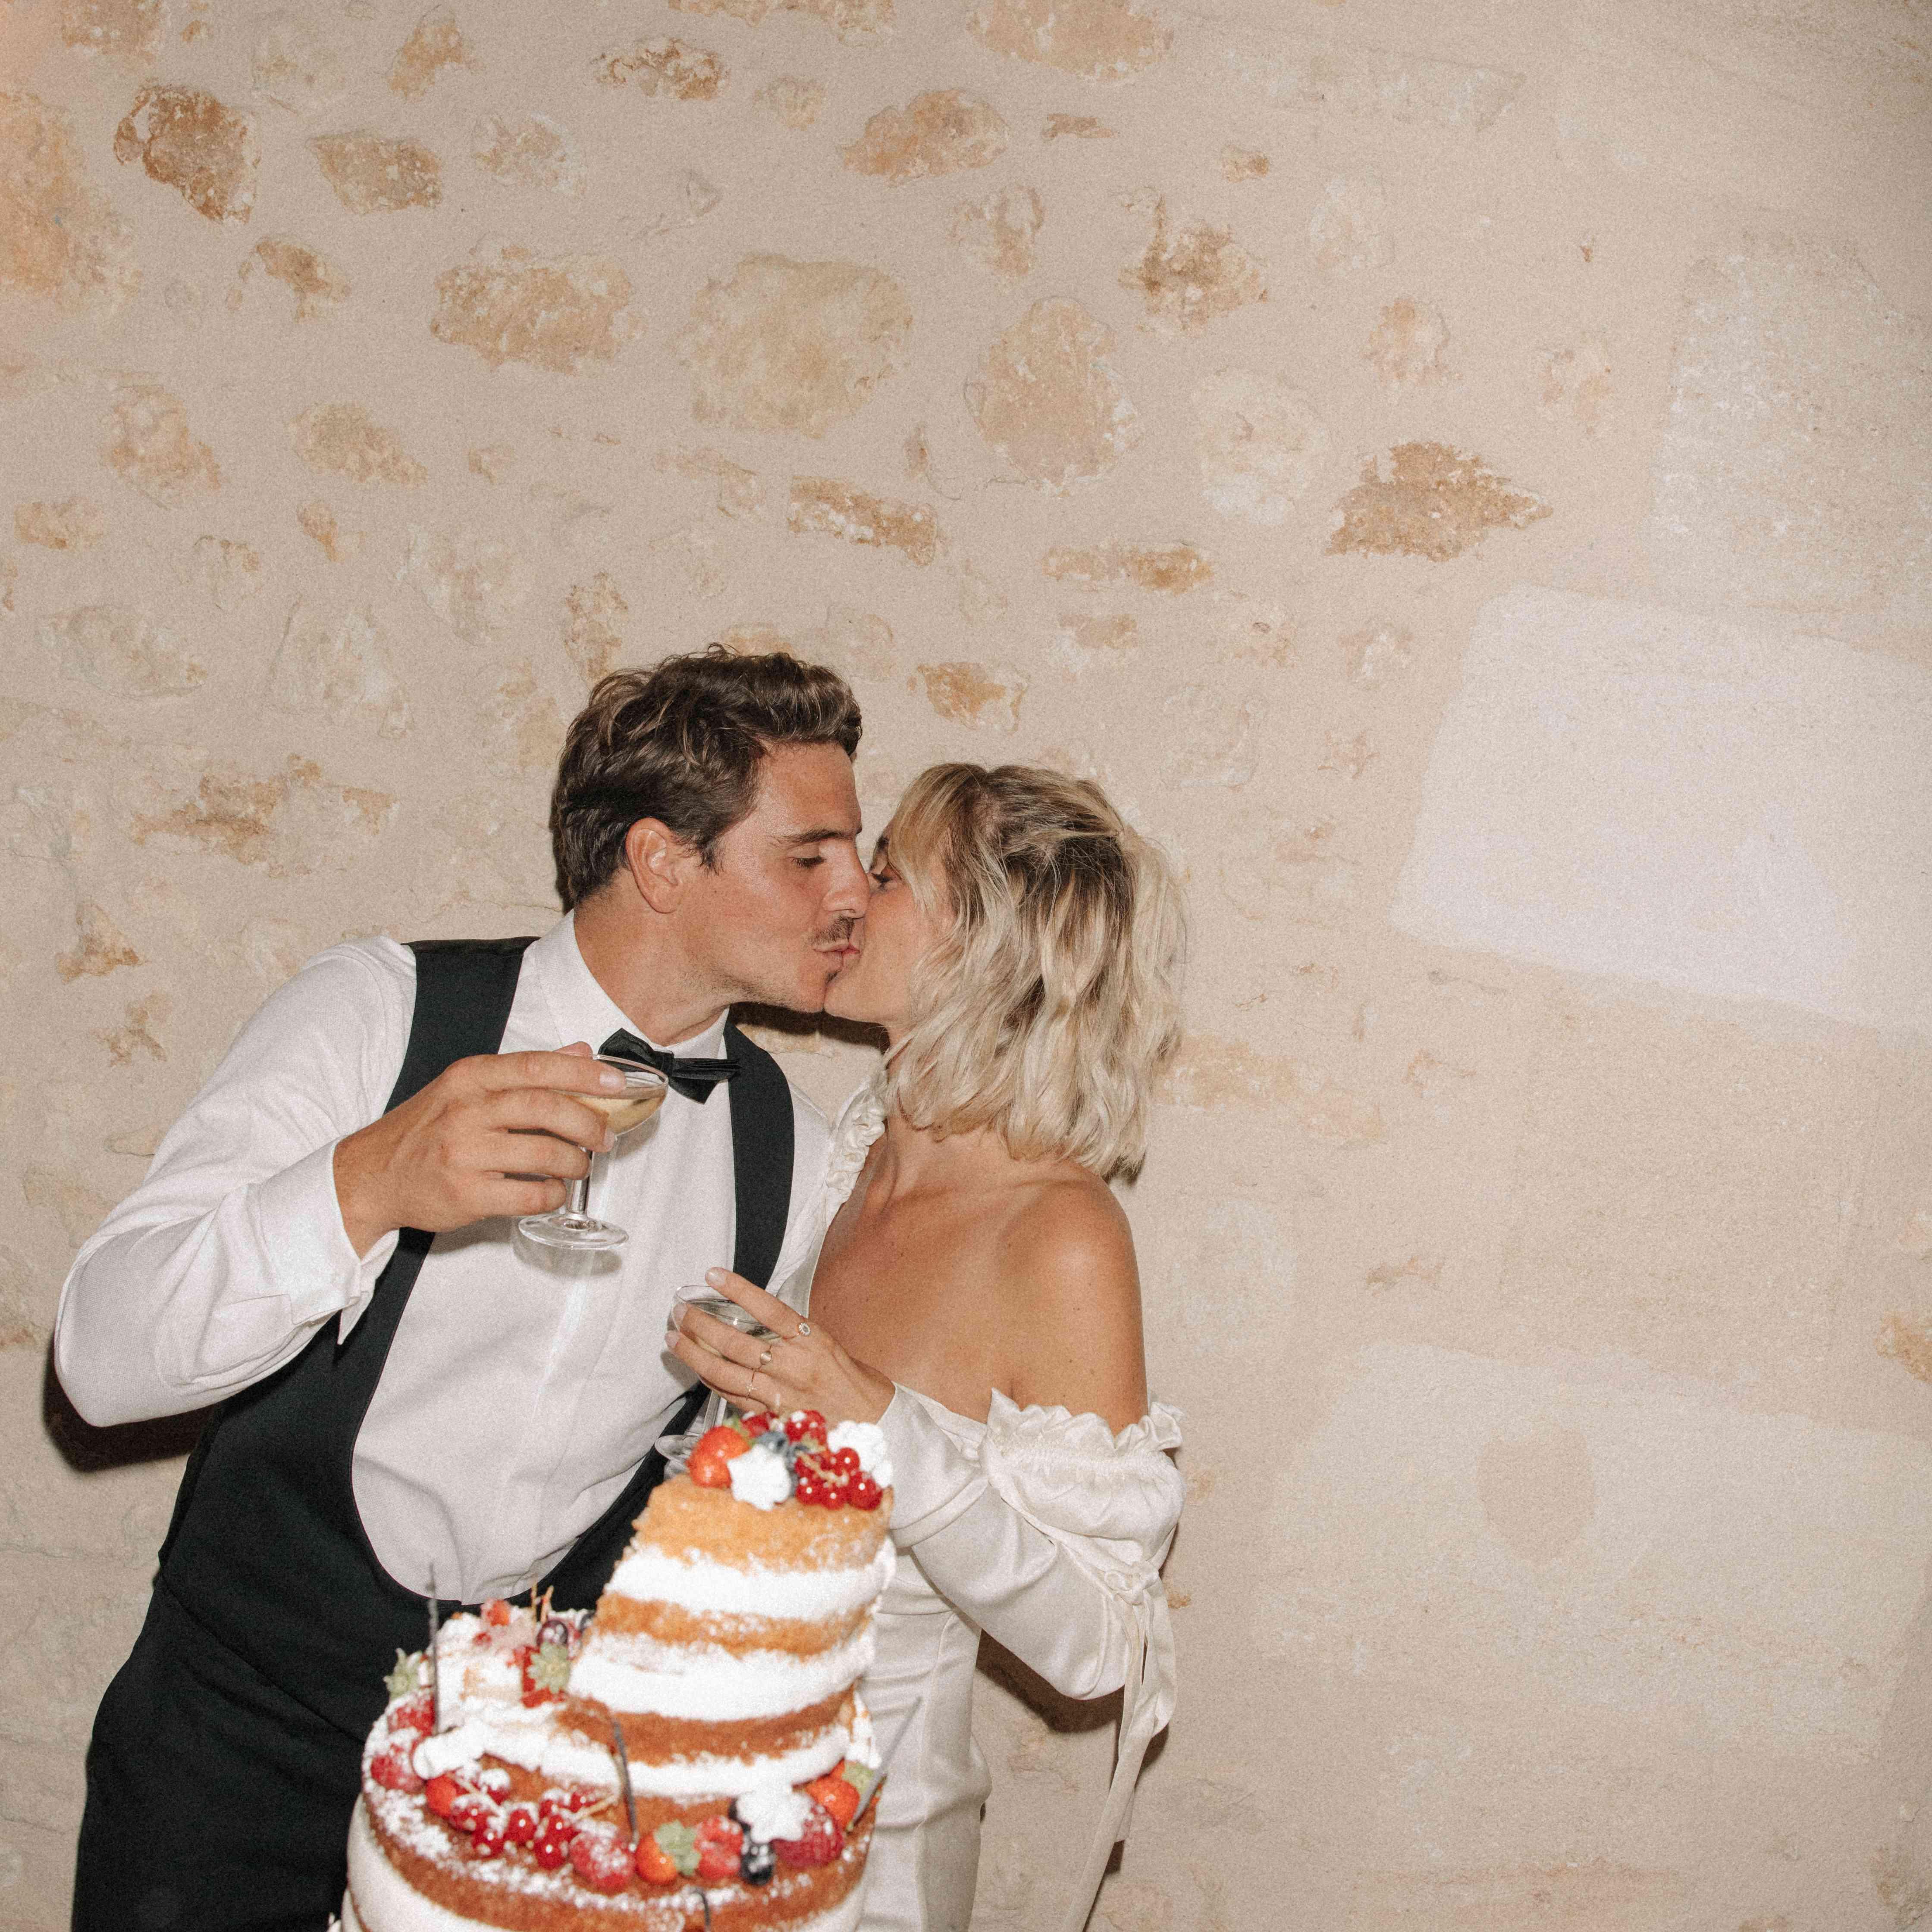 <p>wedding cake</p><br><br>